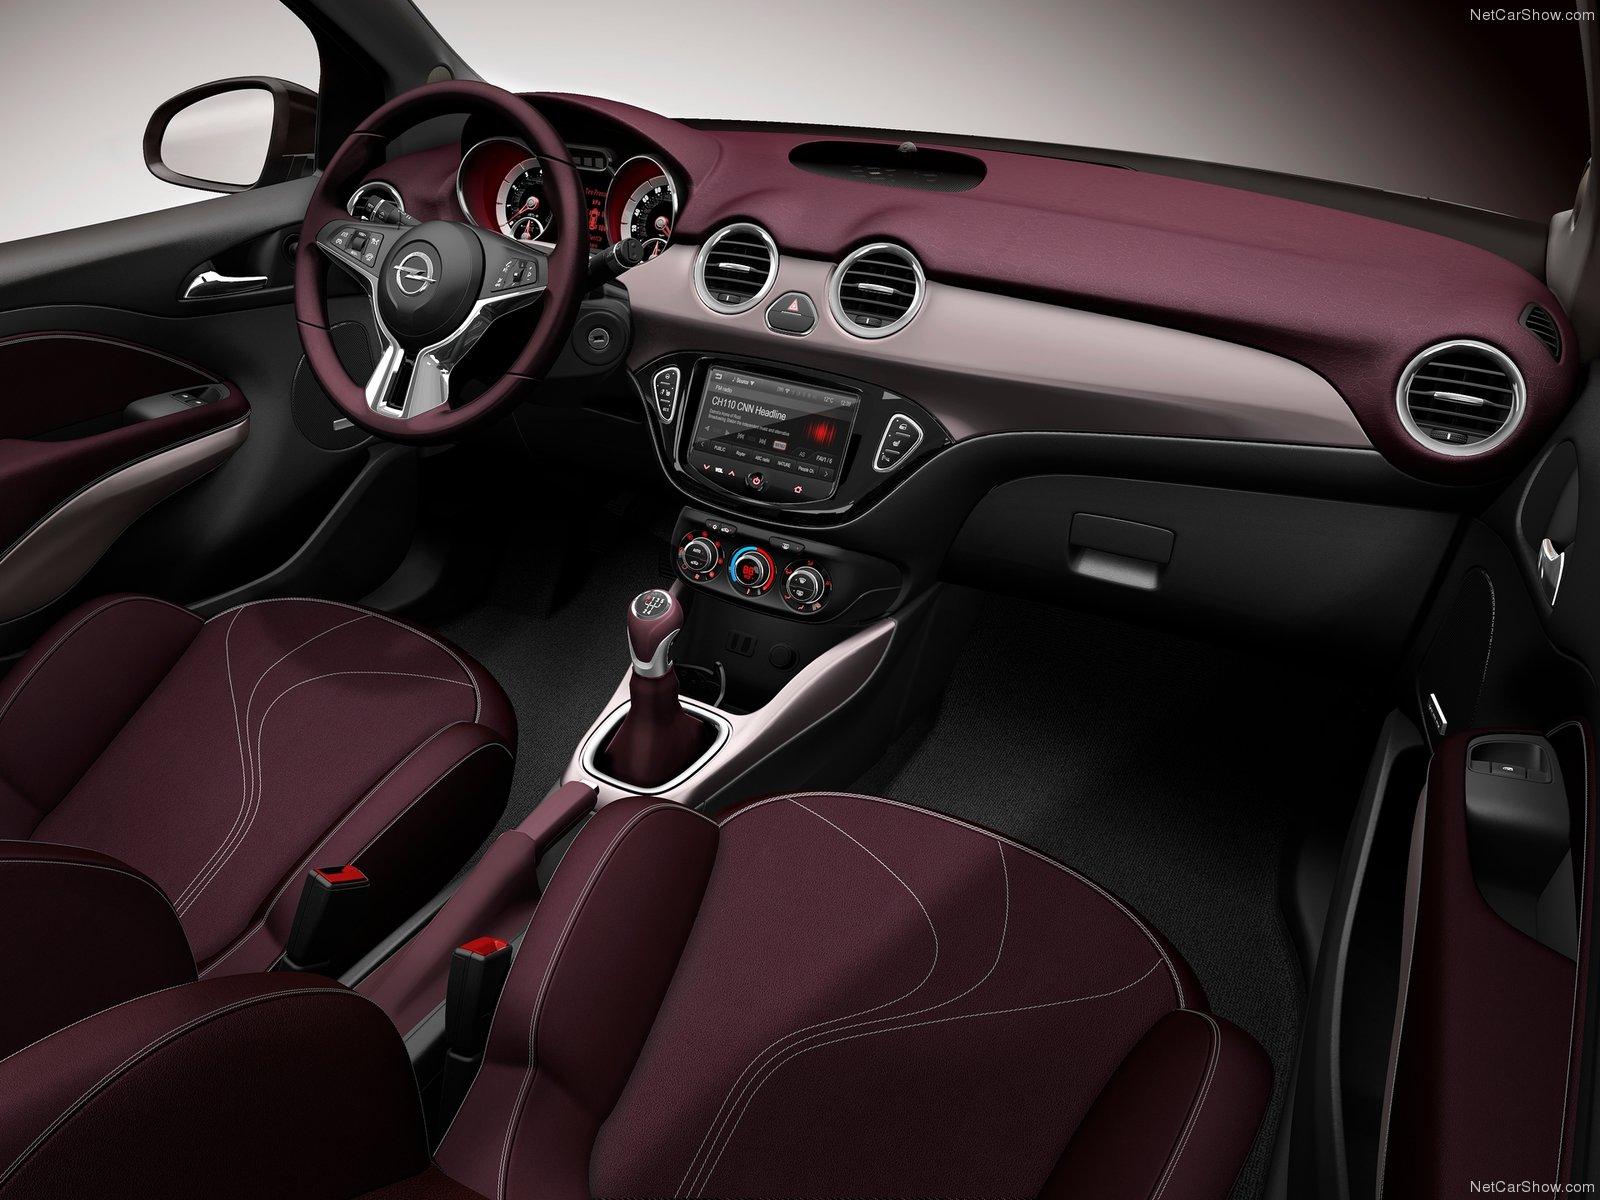 Opel-Adam-2013-1600-52.jpg